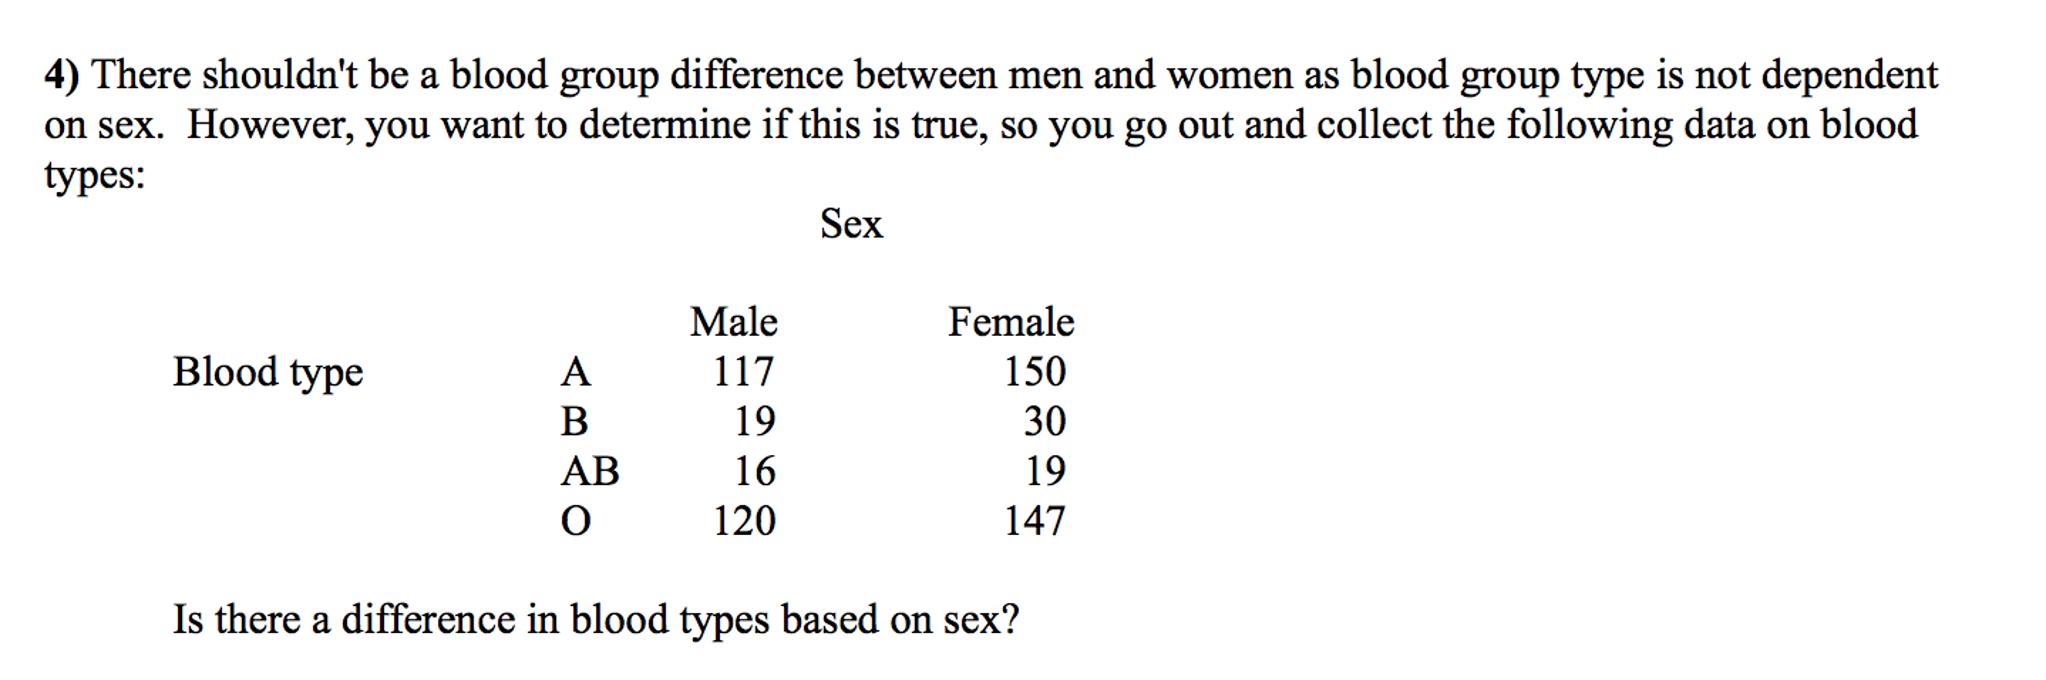 Sexual contact between men and women photos